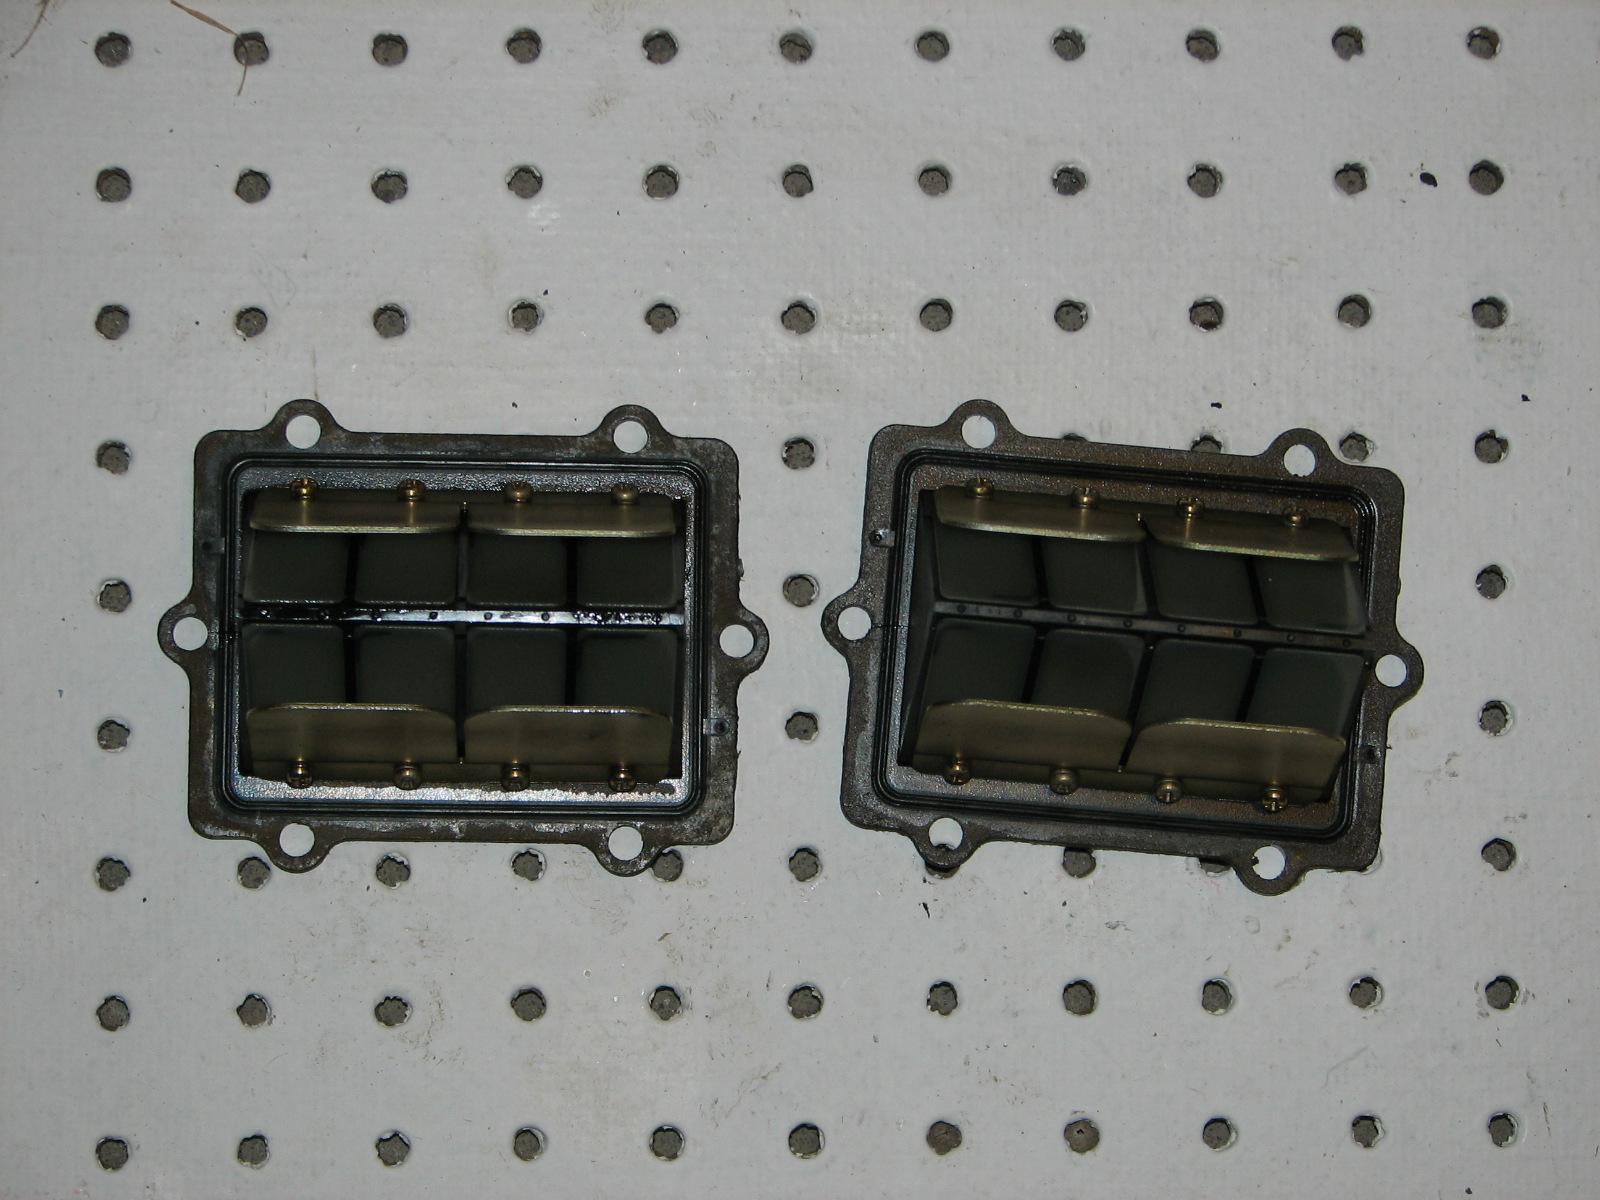 2003 POLARIS EDGE 700 SKS 144 REED CAGES 1201825